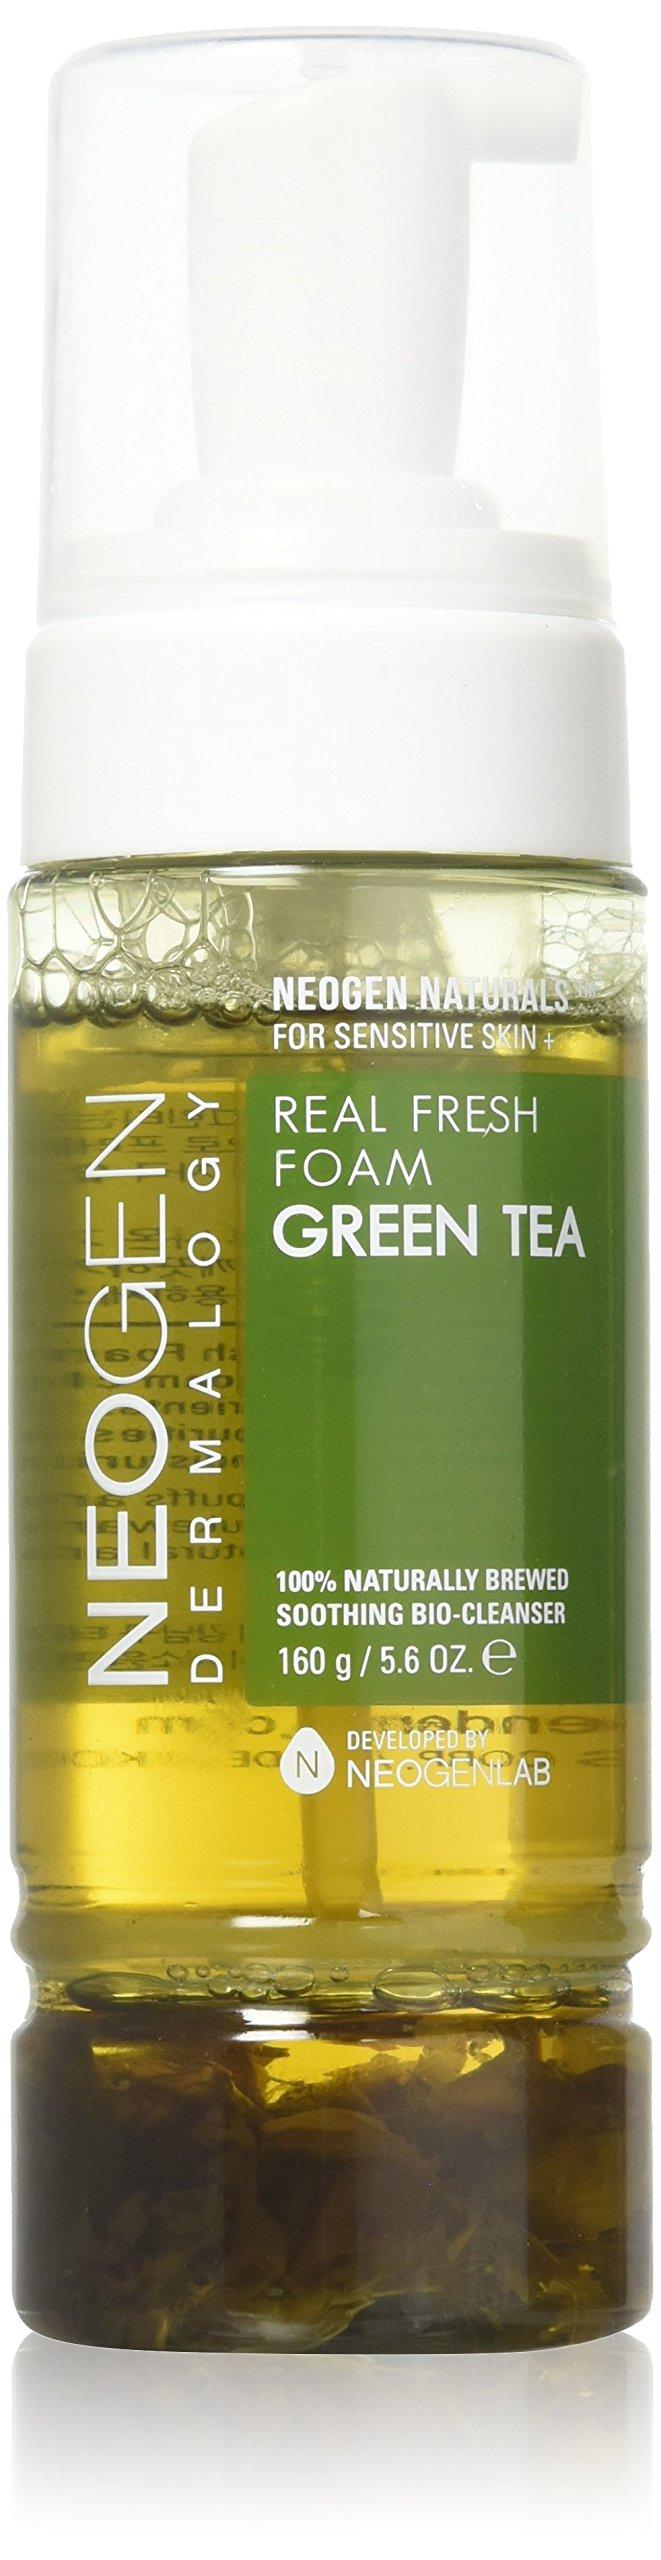 NEOGEN DERMALOGY REAL FRESH FOAM CLEANSER GREEN TEA 5.6 oz / 160g by NEOGEN DERMALOGY